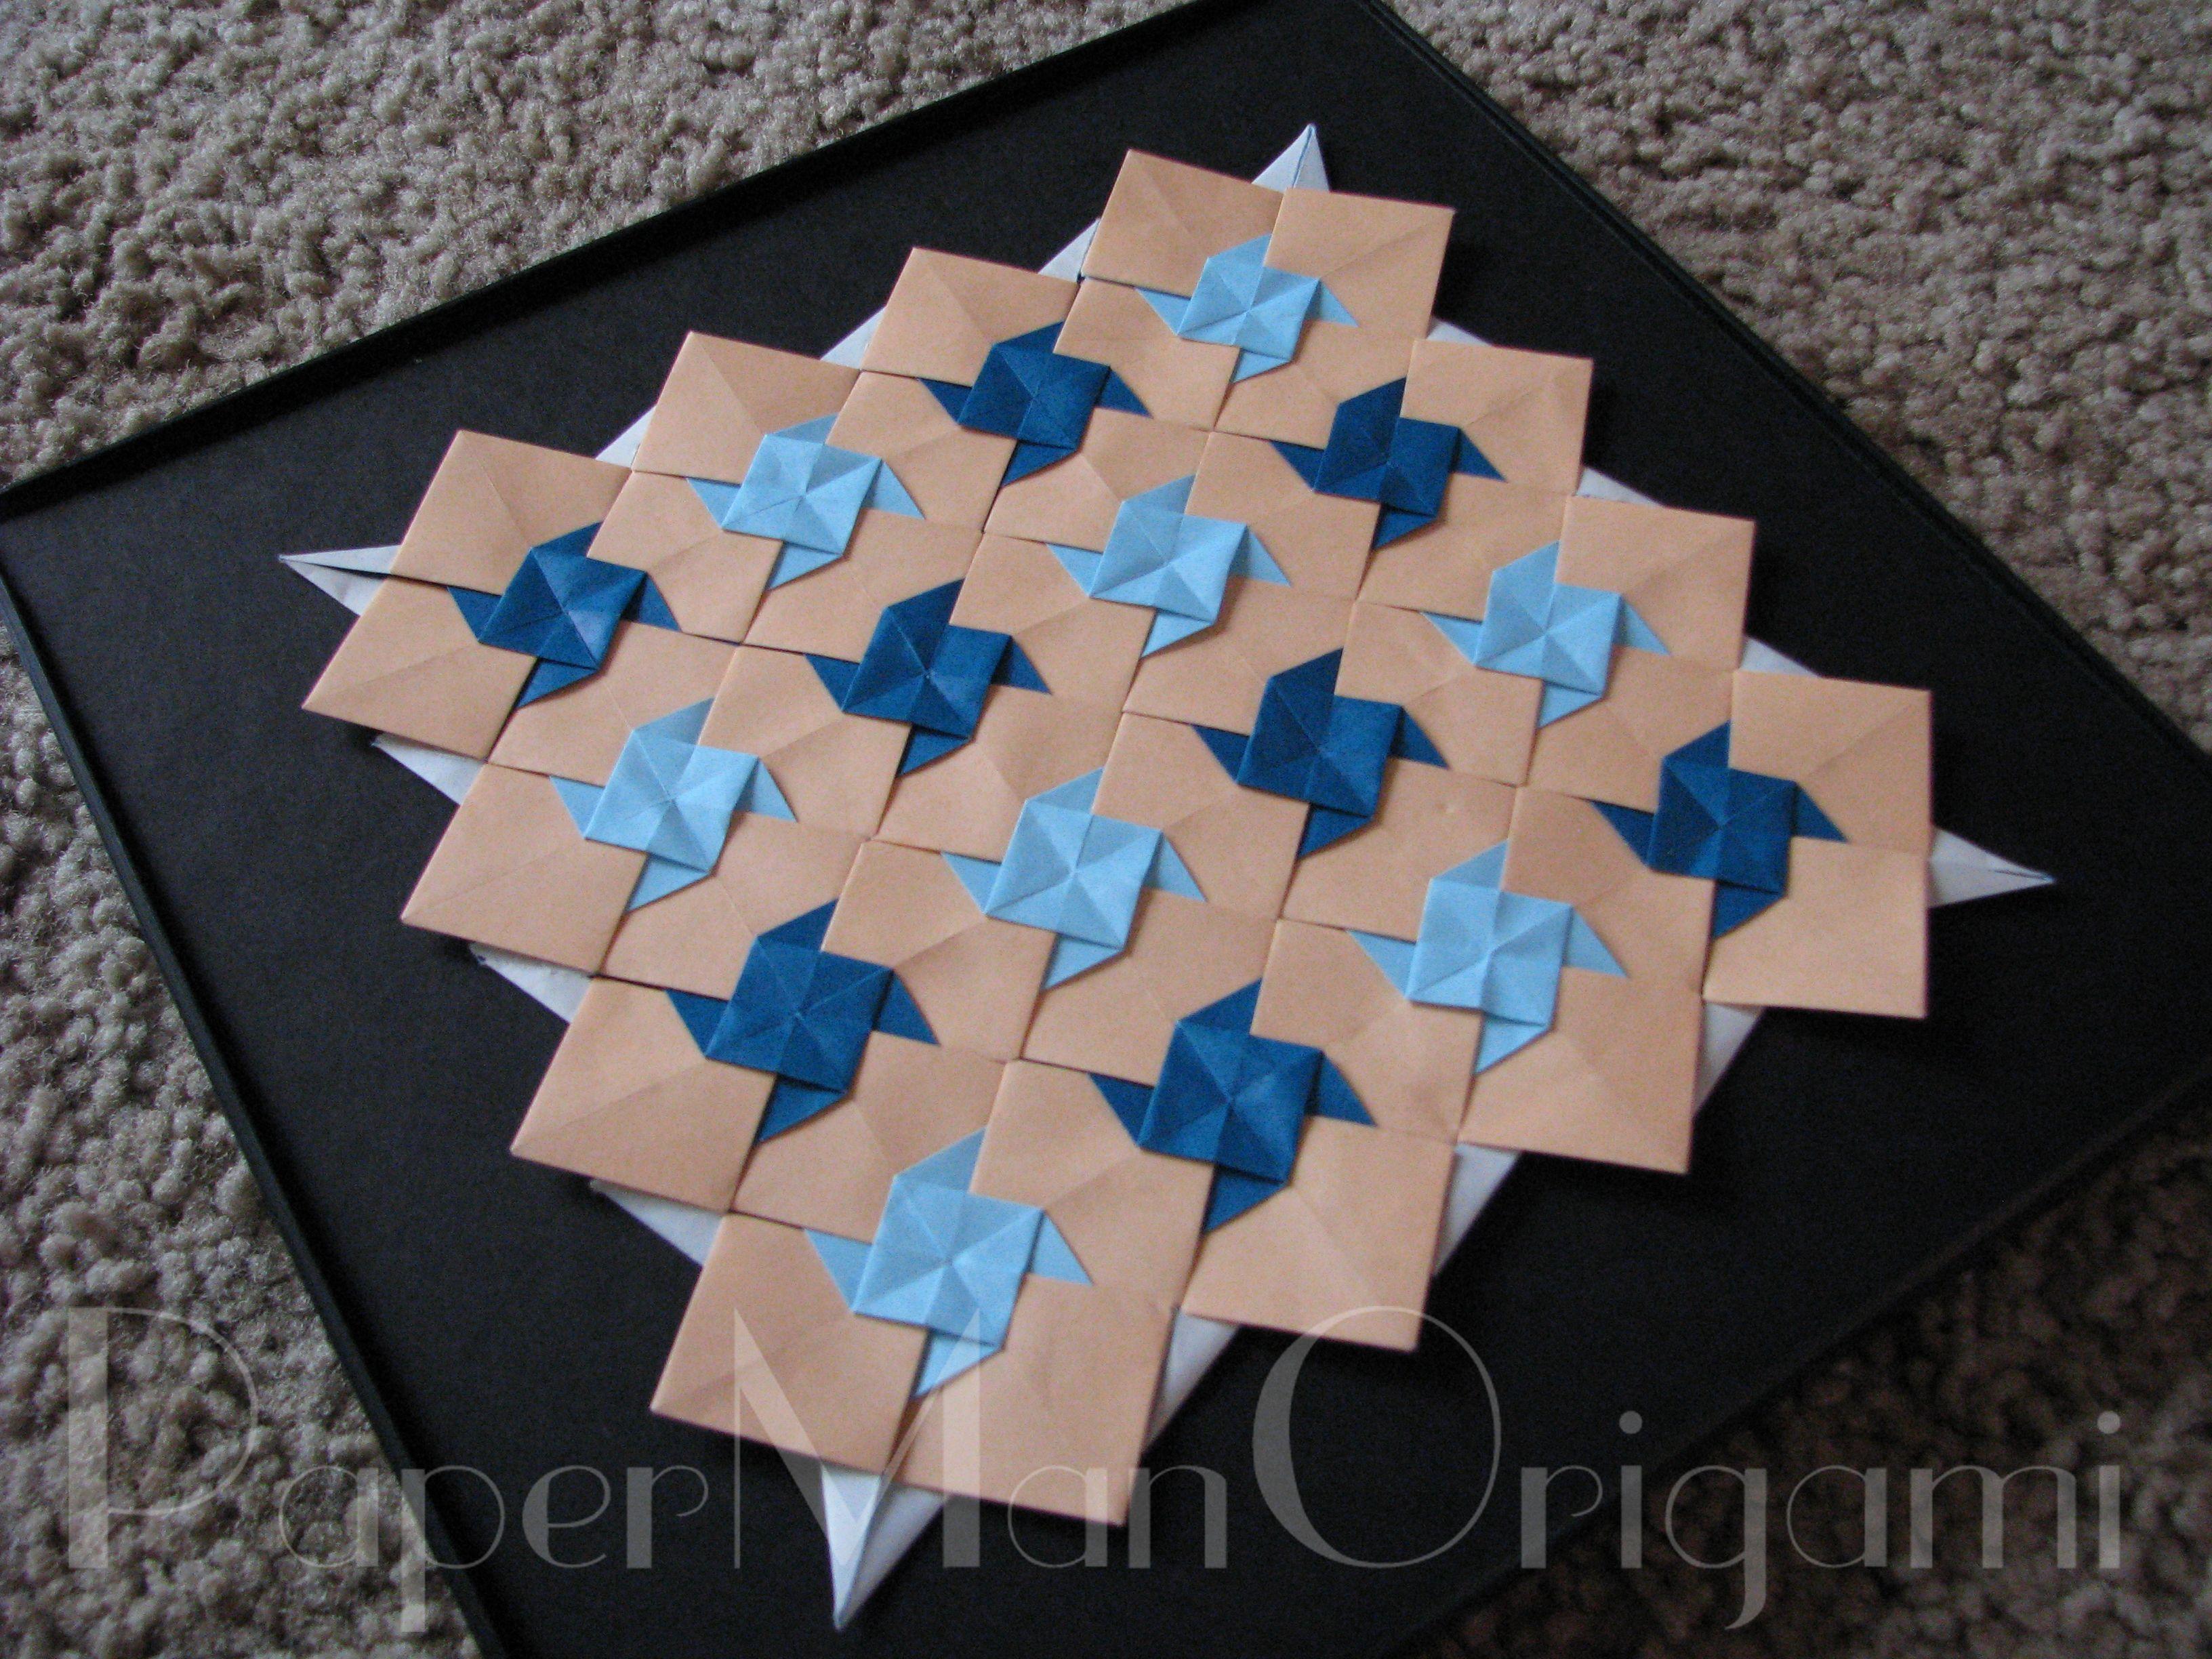 Tomoko Fuse Origami Quilts Star 3-4   Cool Origami   Pinterest ... : folded quilt blocks - Adamdwight.com